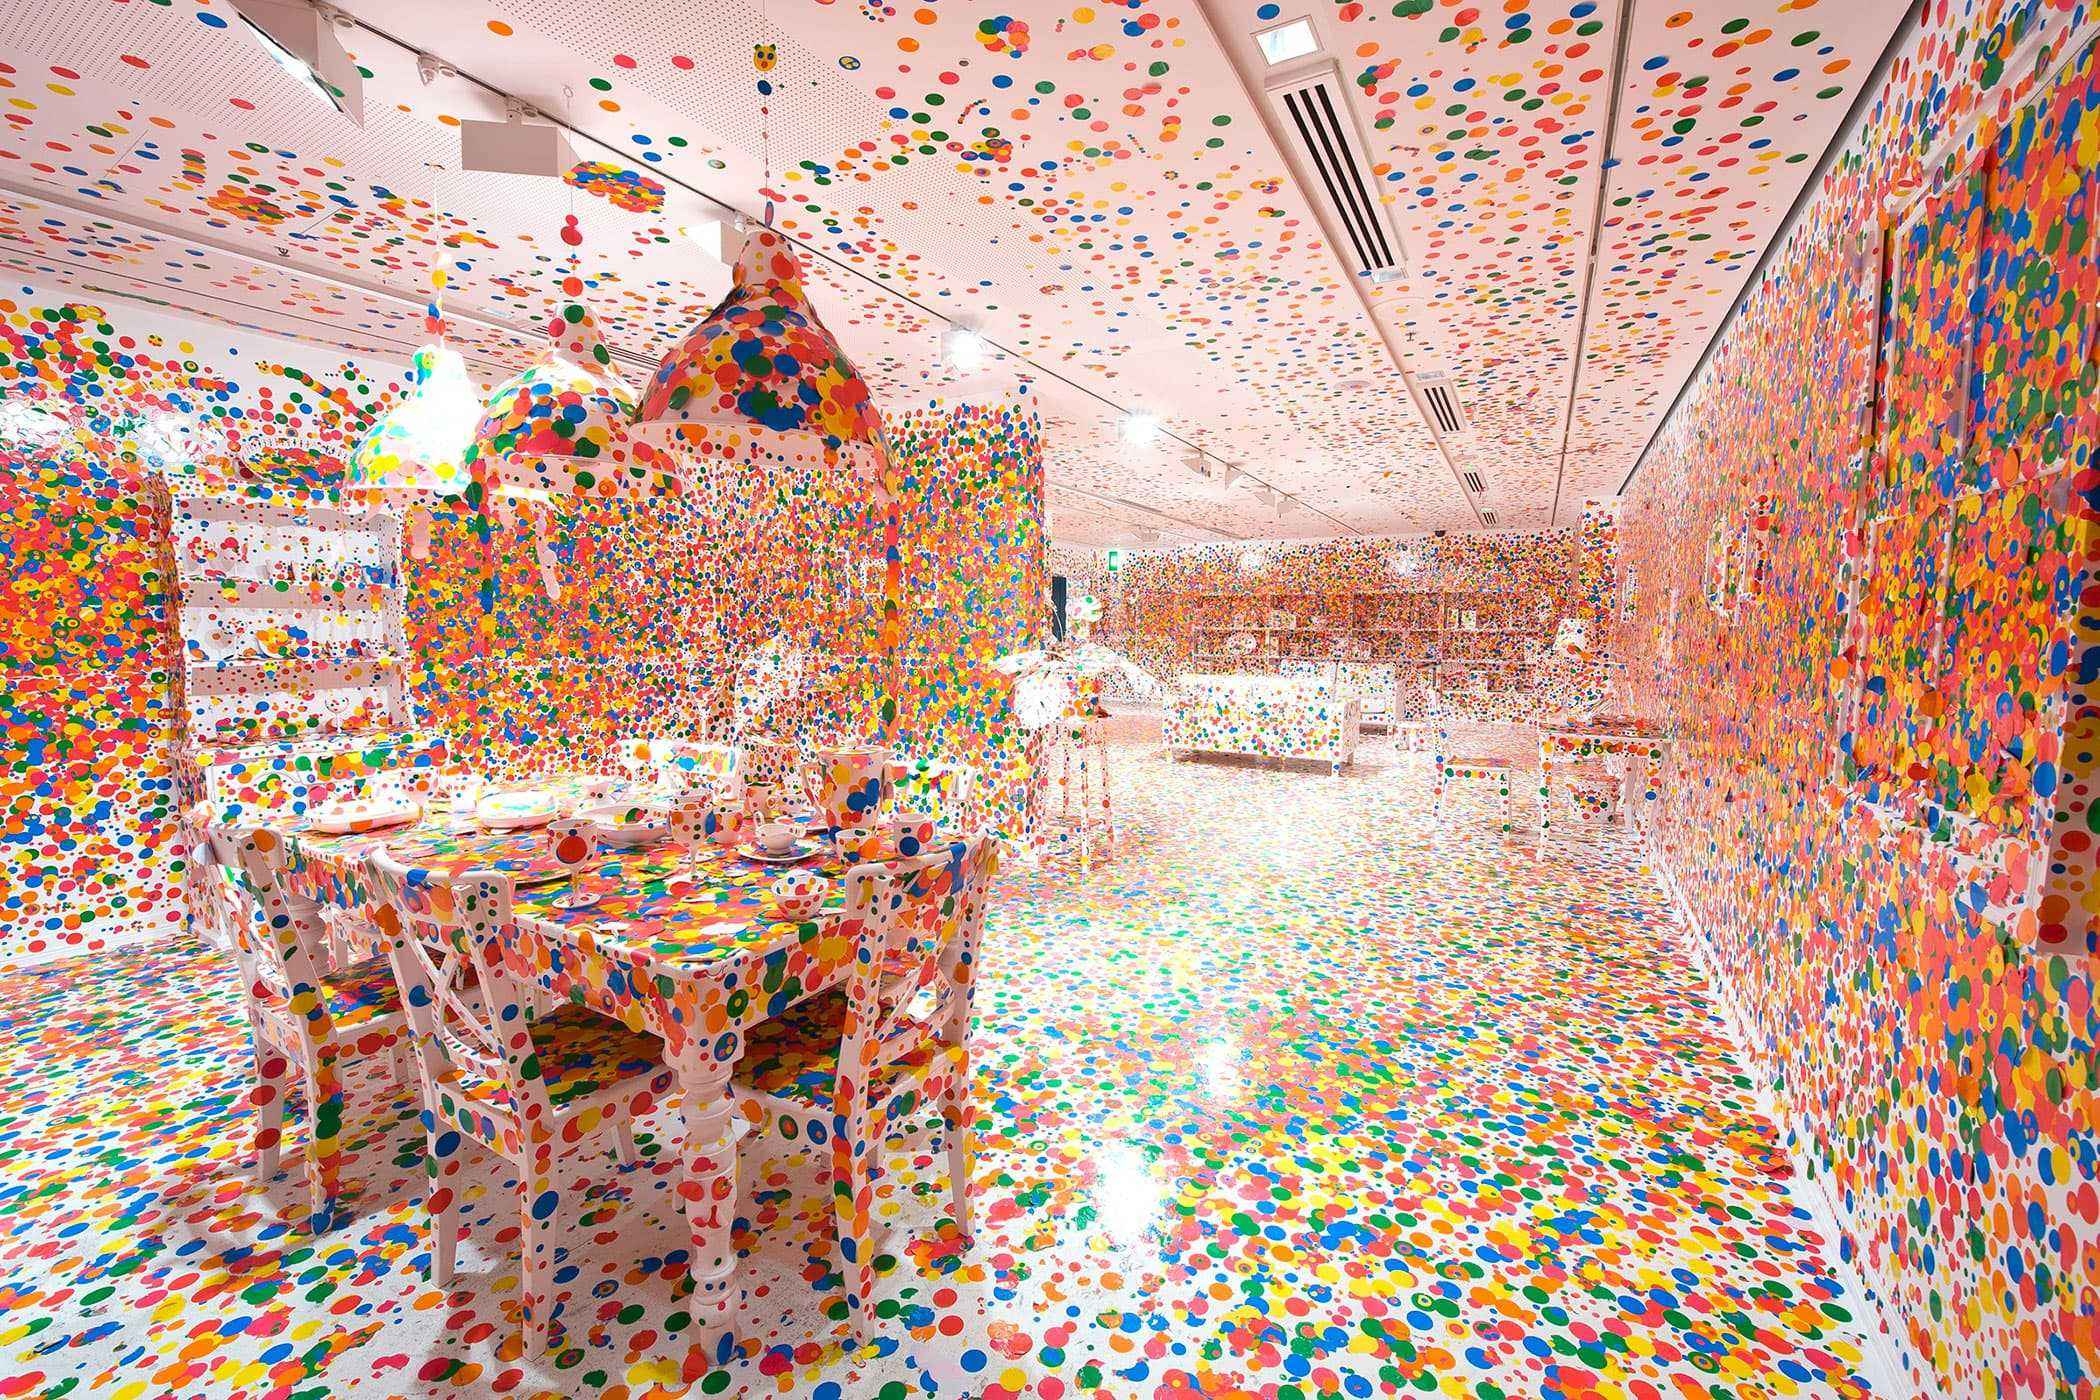 Yayoi-Kusama-Art-The-Obliteration-Room-2002-to-present-1